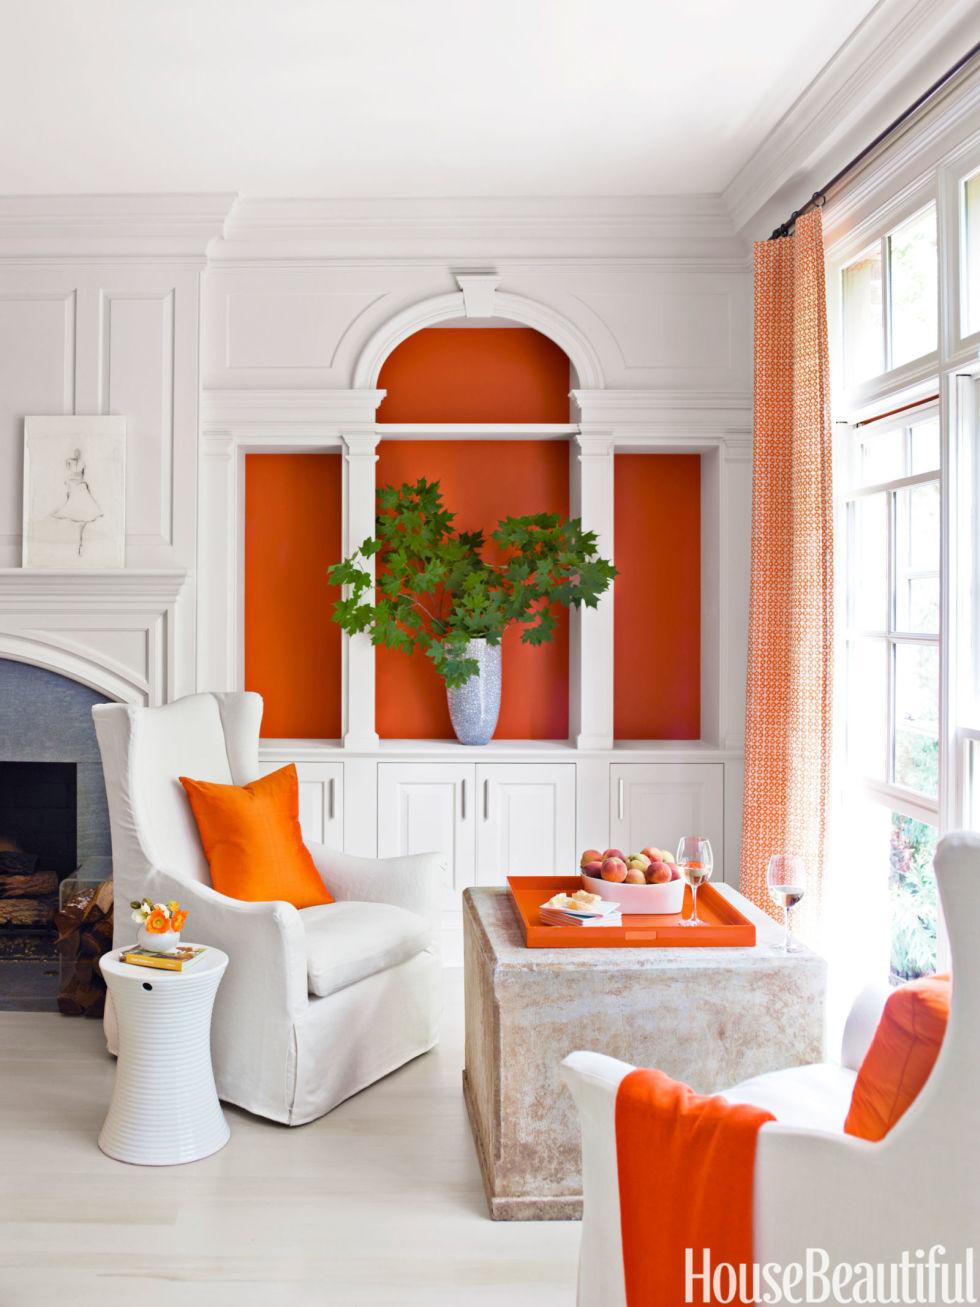 house decor ideas 20 easy home decorating ideas - interior decorating and decor tips ZWESCID